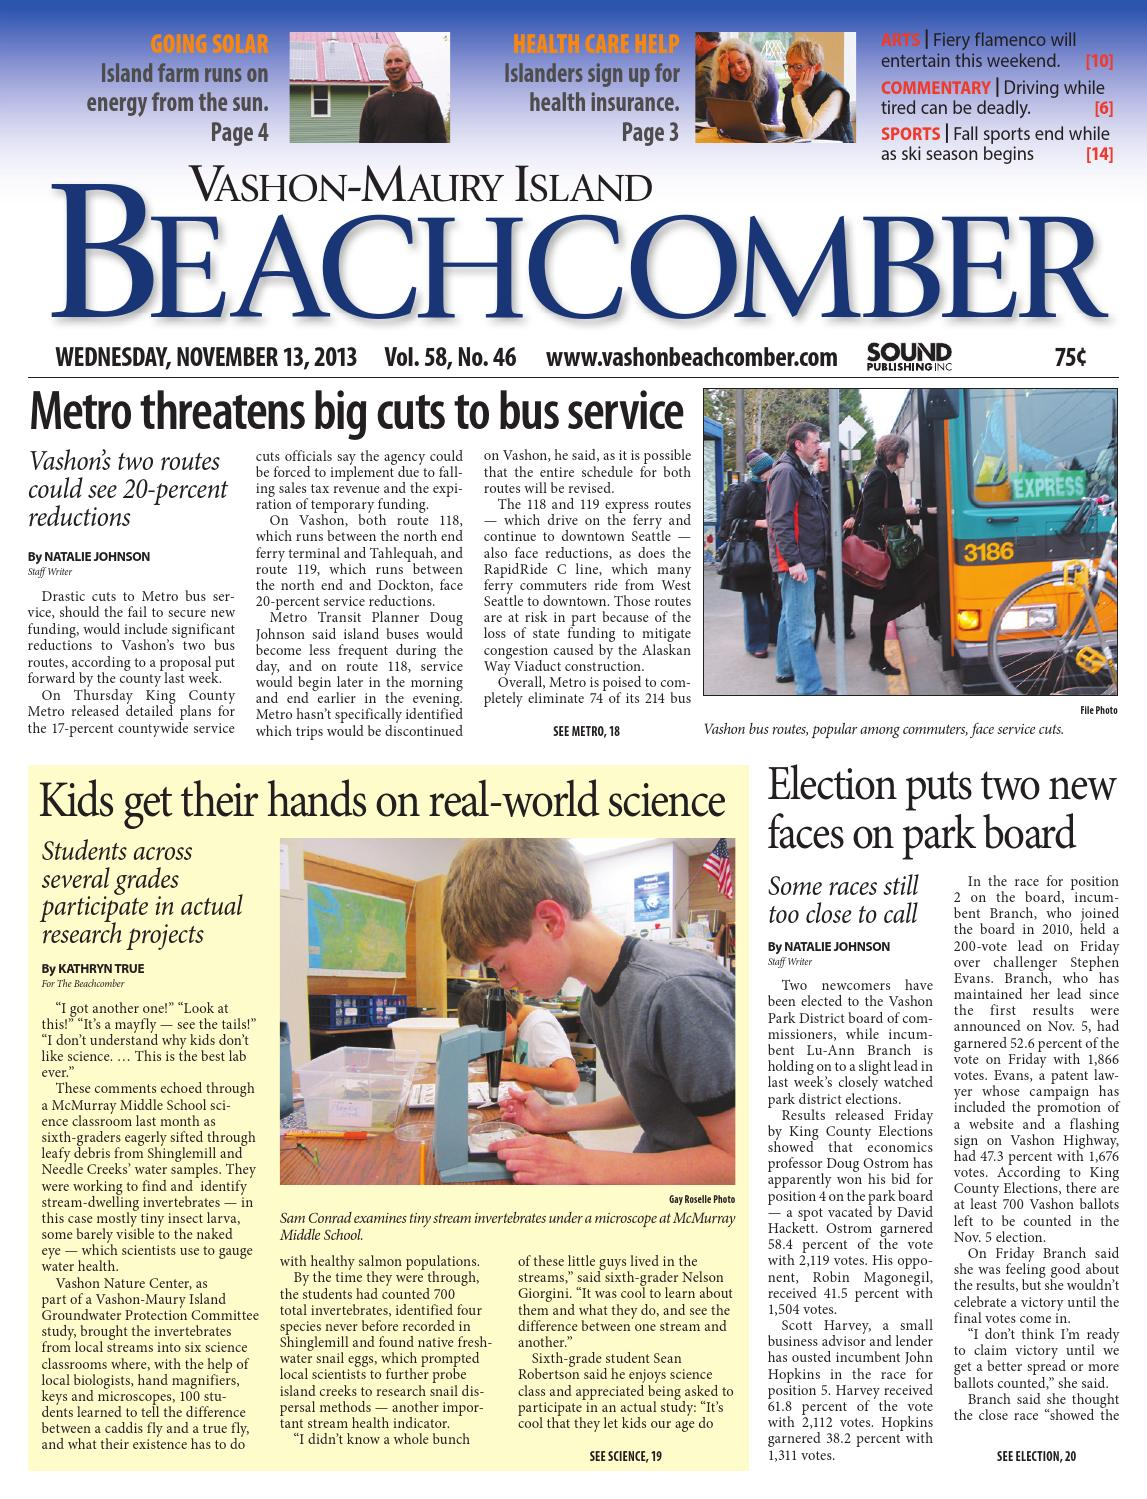 Vashon-Maury Island Beachcomber, November 13, 2013 by Sound